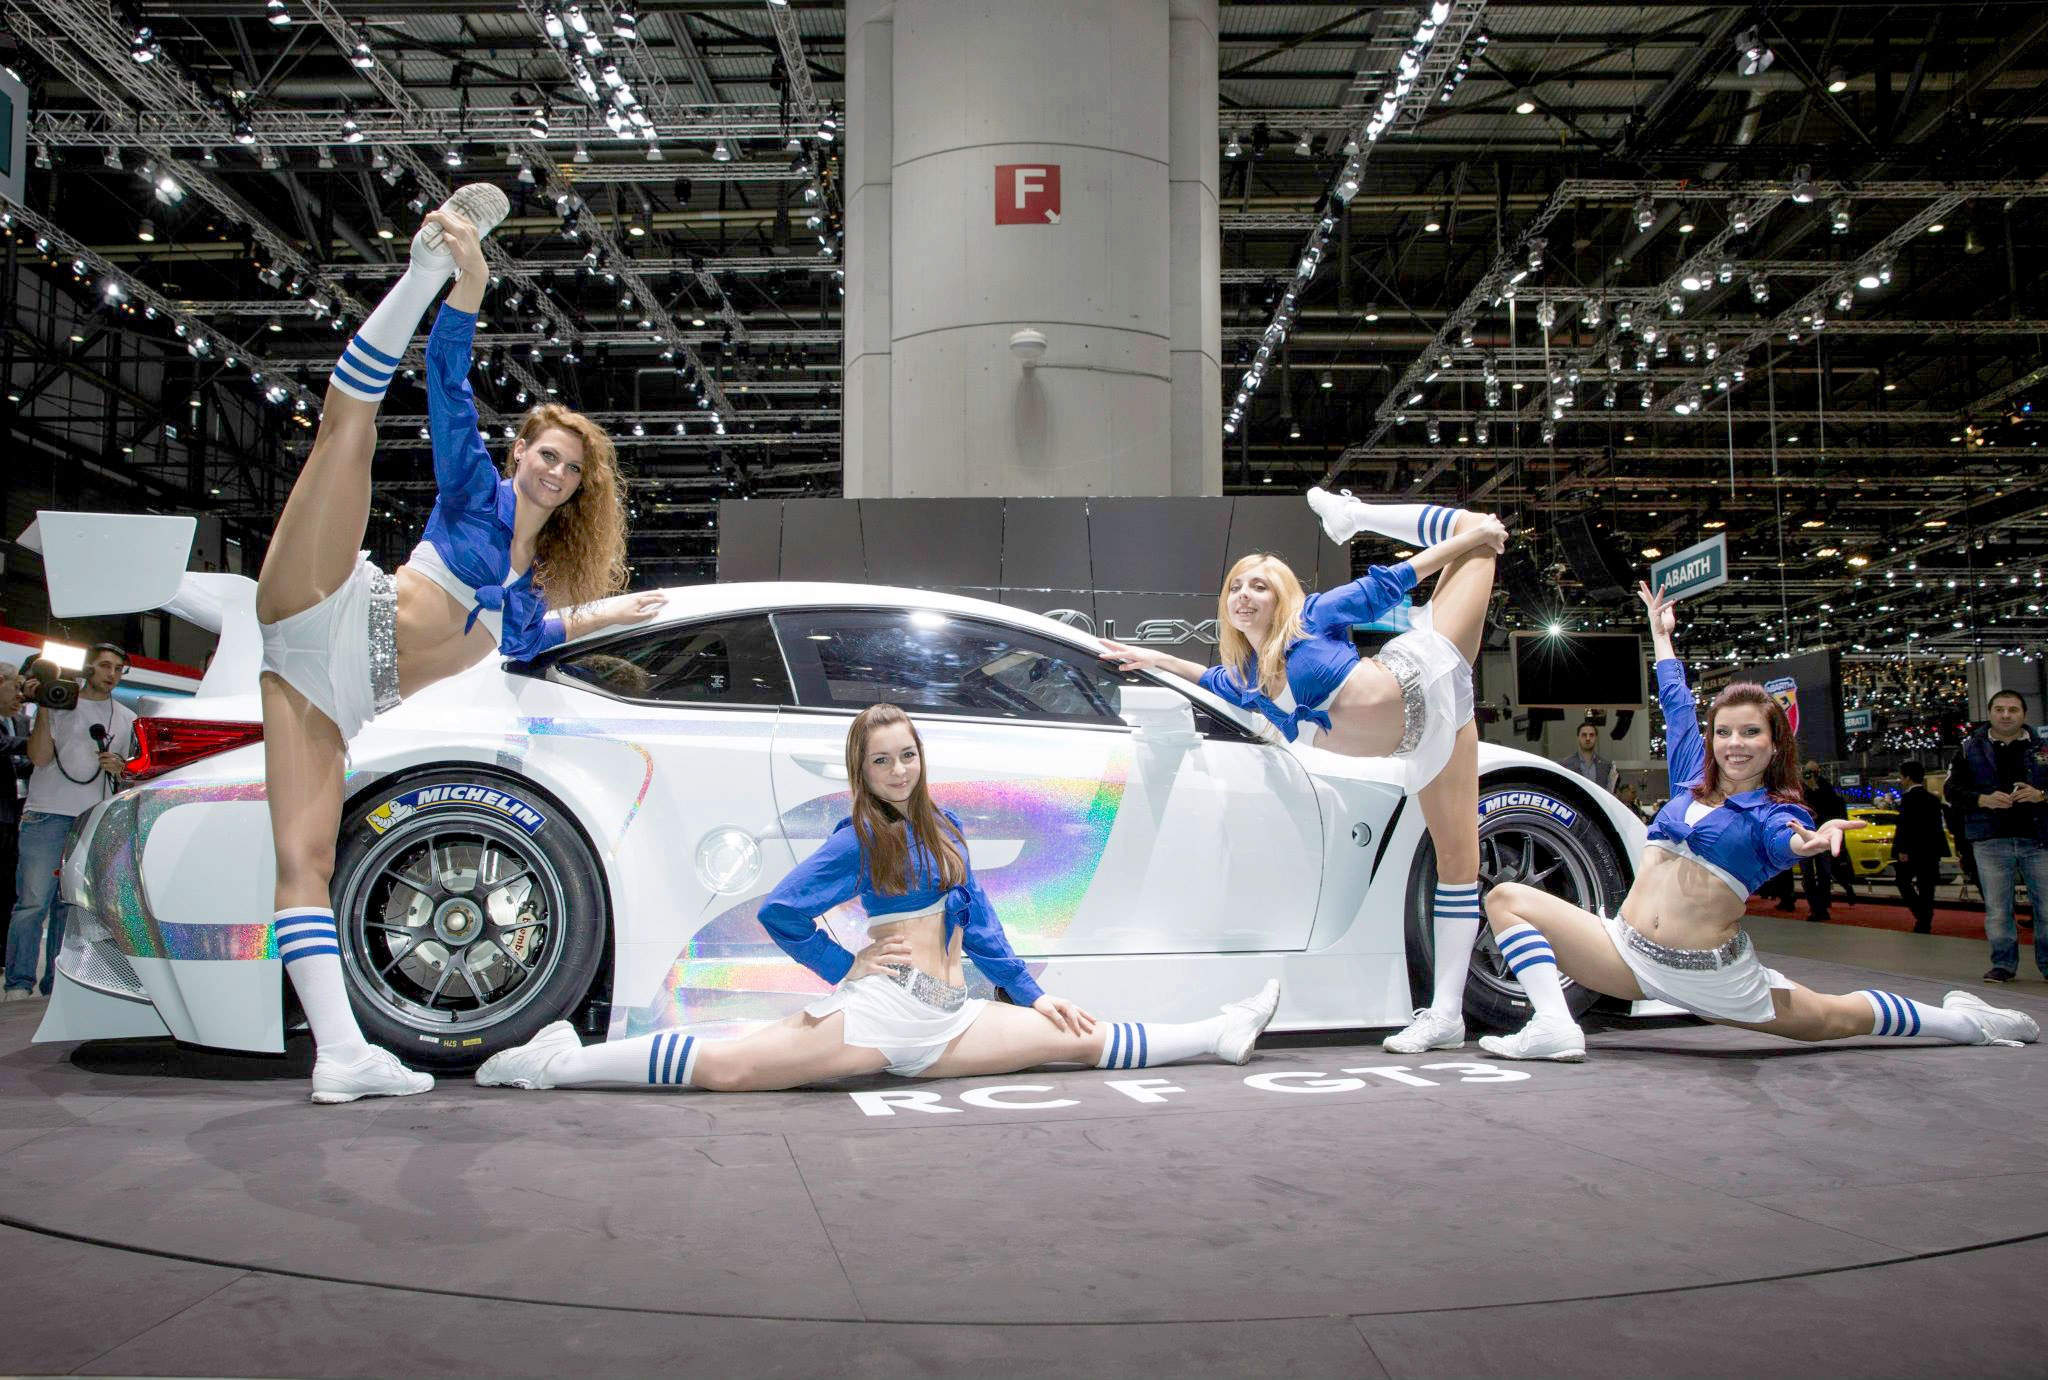 http://lexusenthusiast.com/images/weblog/14-03-04-lexus-rc-f-gt3-cheerleaders.jpg